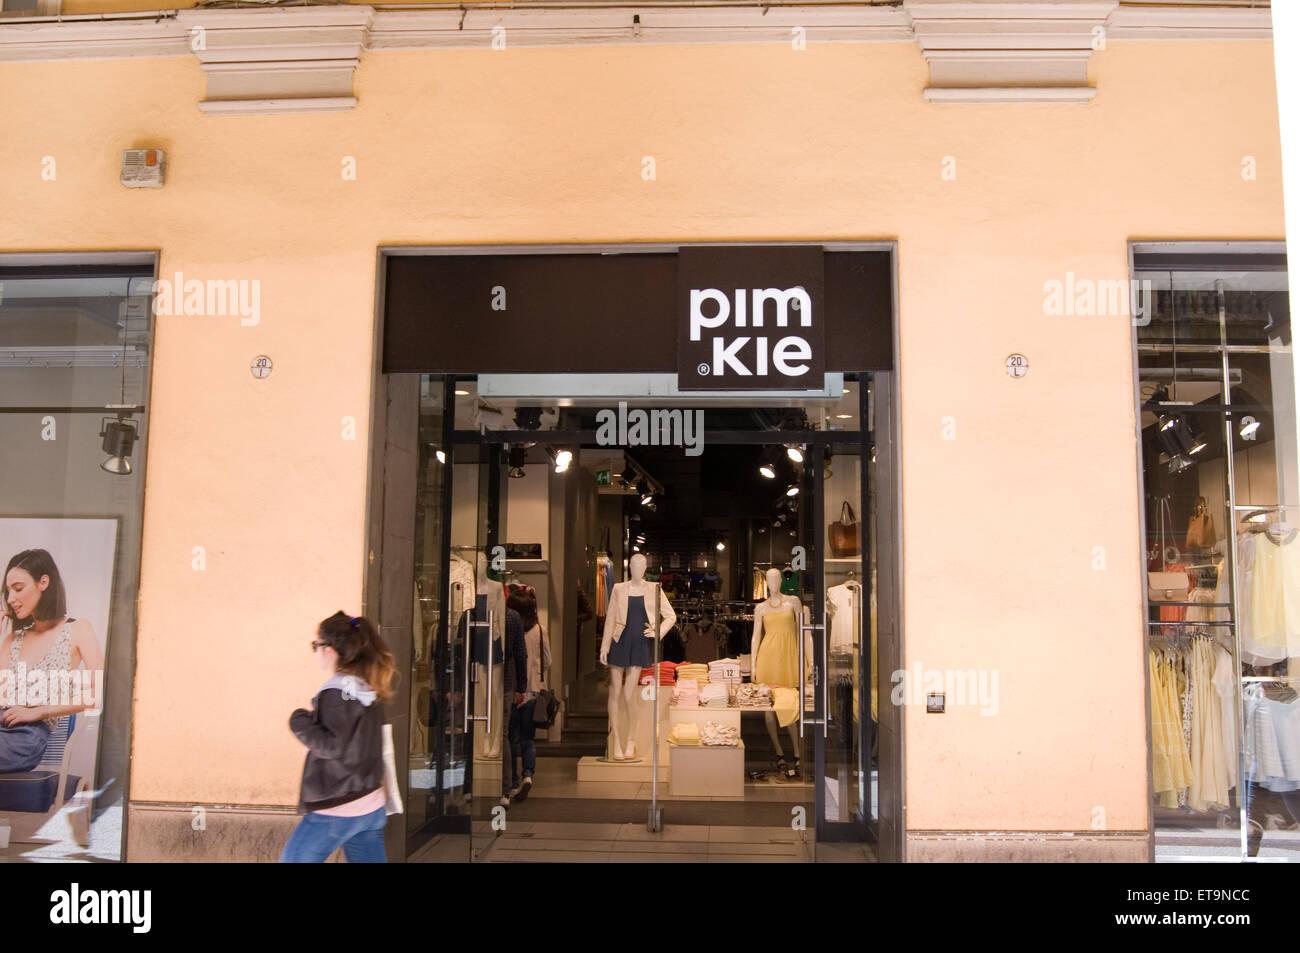 64e9be58dff pimkie pim kie womens clothes retailer retail shop shops clothing fashion  chain brand